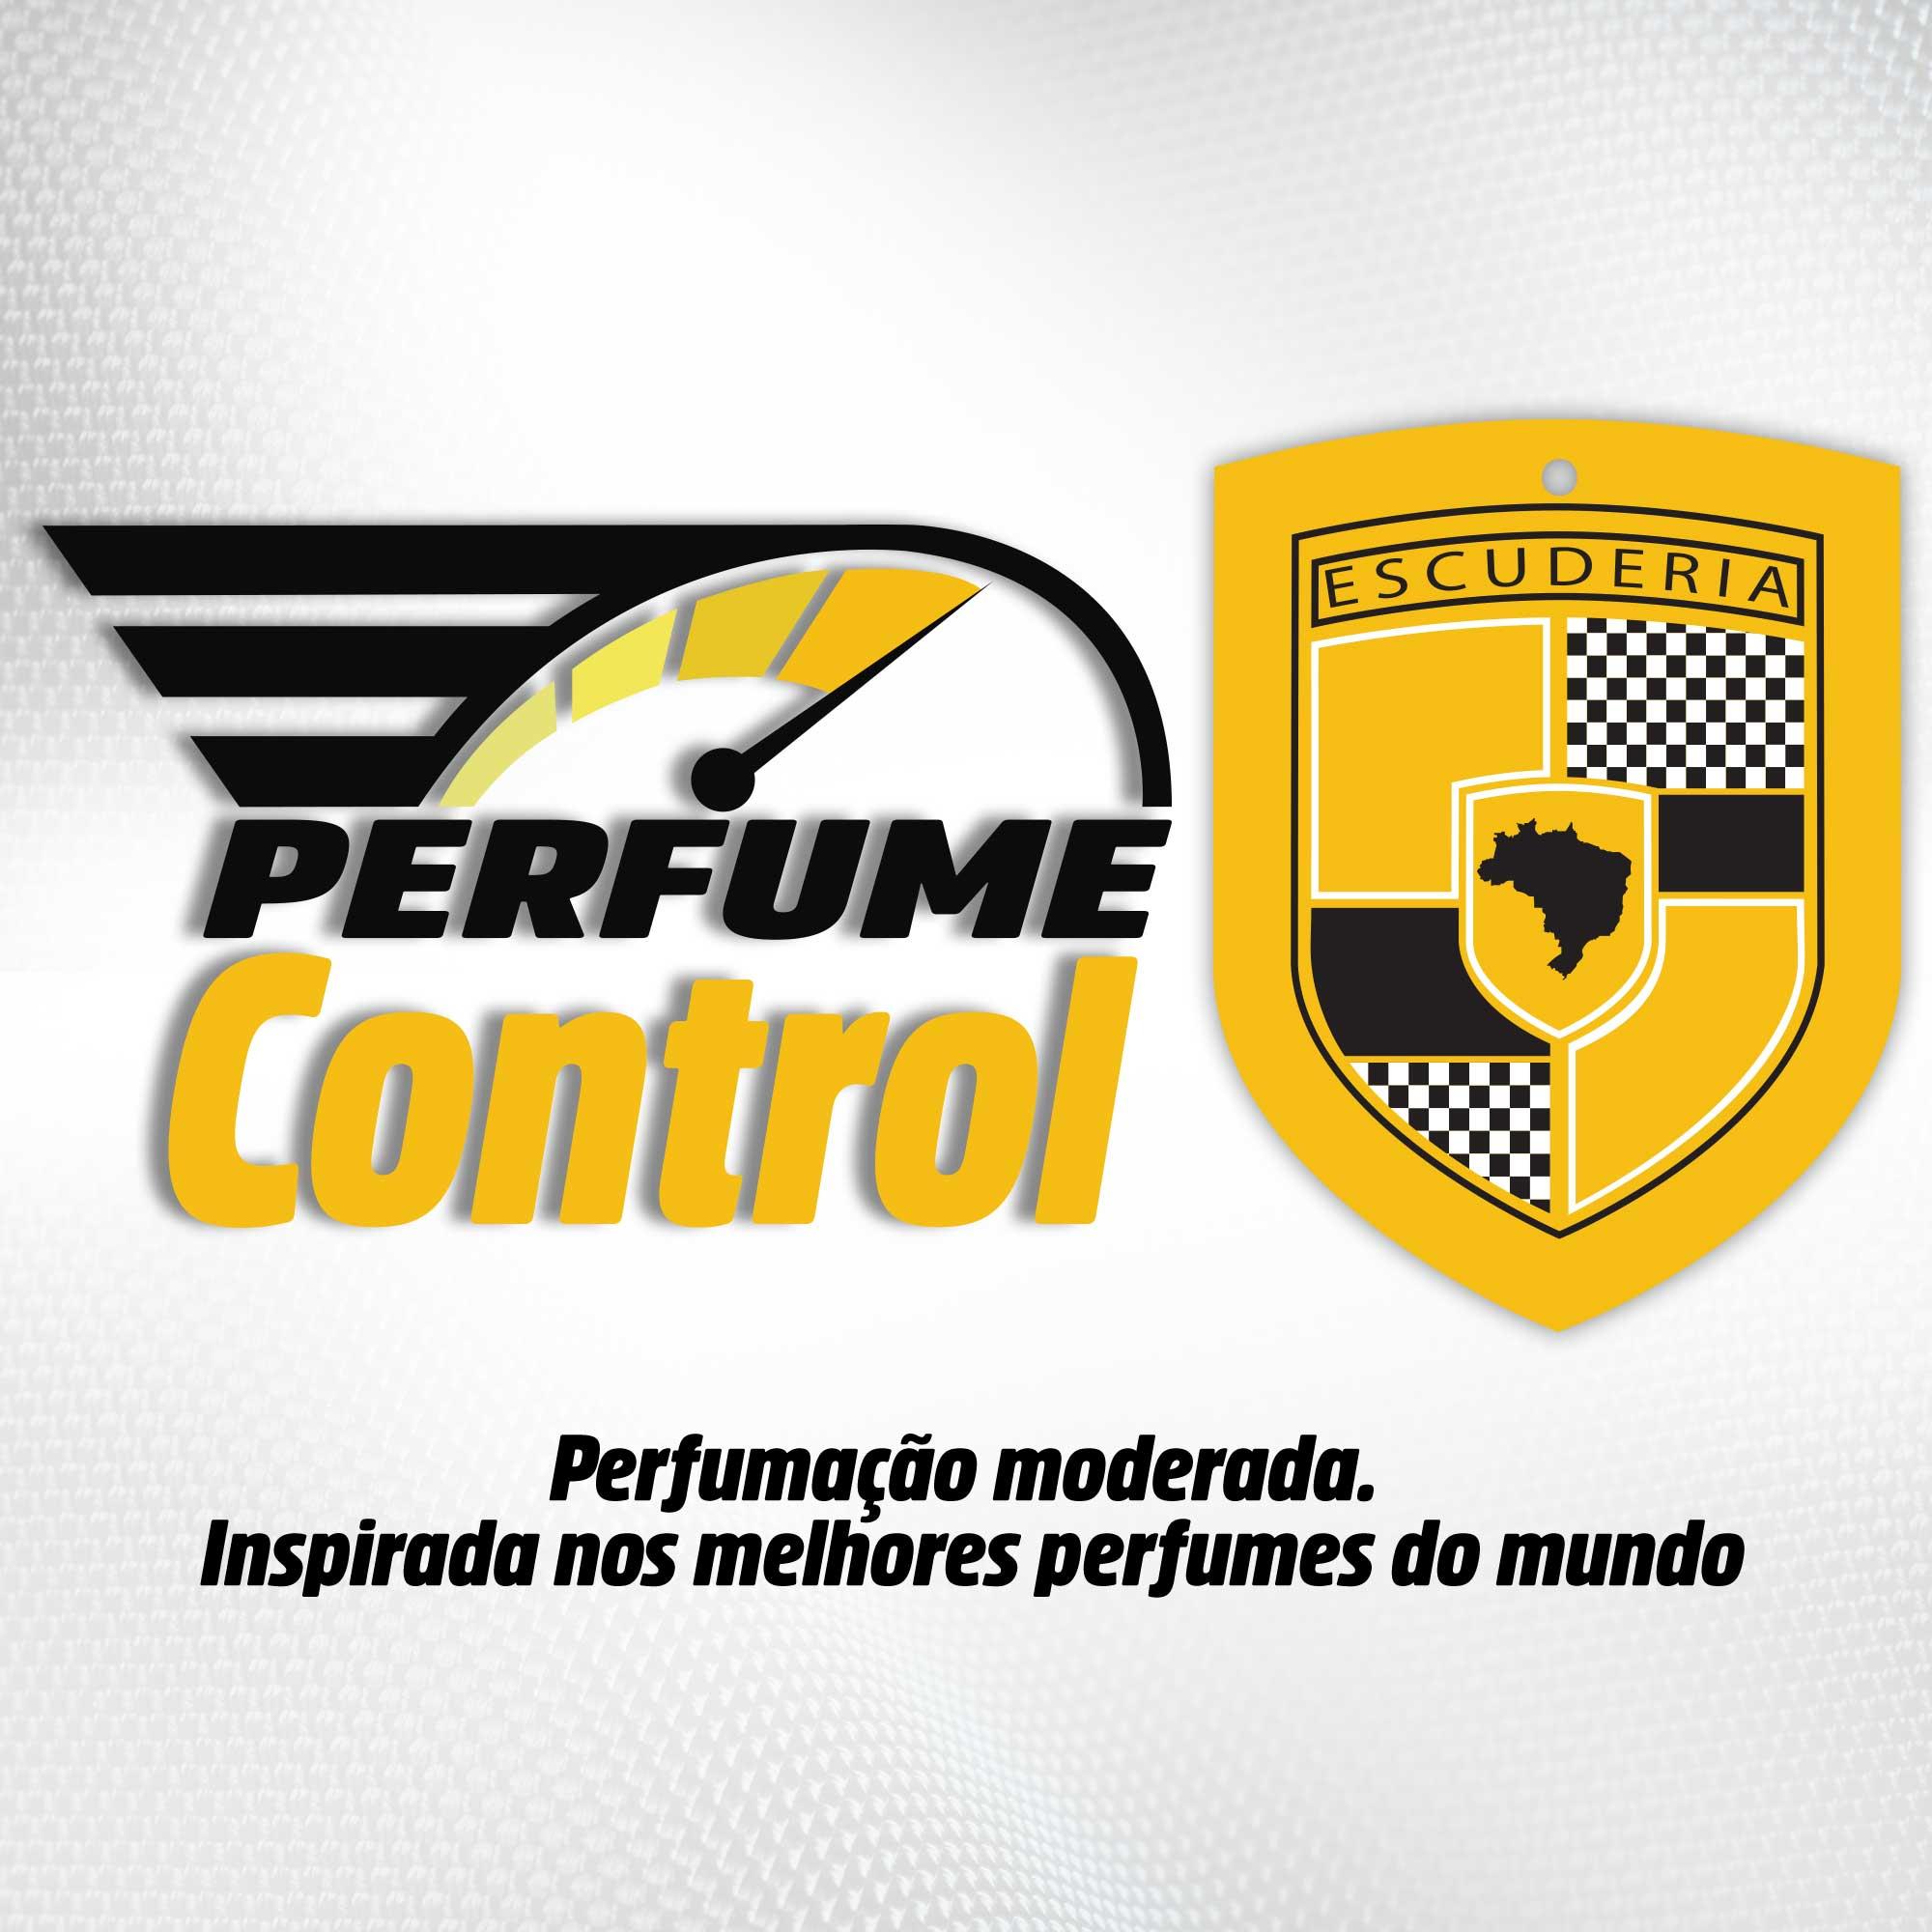 Kit Test-Drive 11 fragrâncias  - Escuderia do Brasil